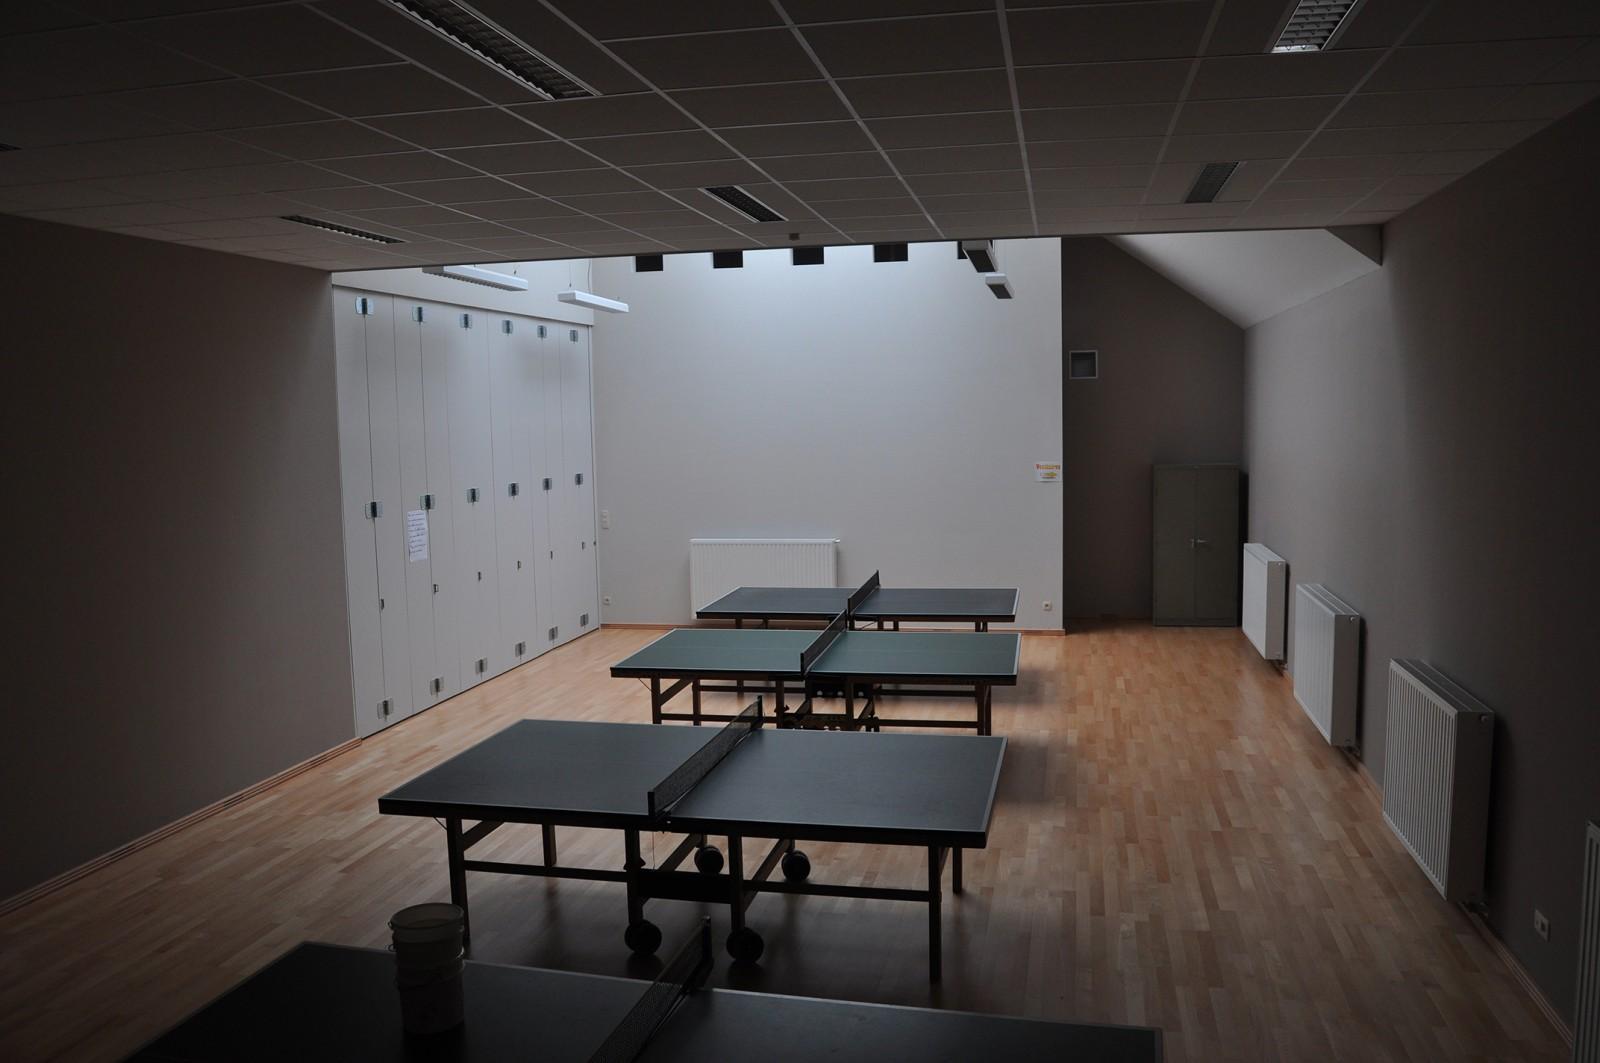 transformation de la salle st maximin rive gauche architectes. Black Bedroom Furniture Sets. Home Design Ideas